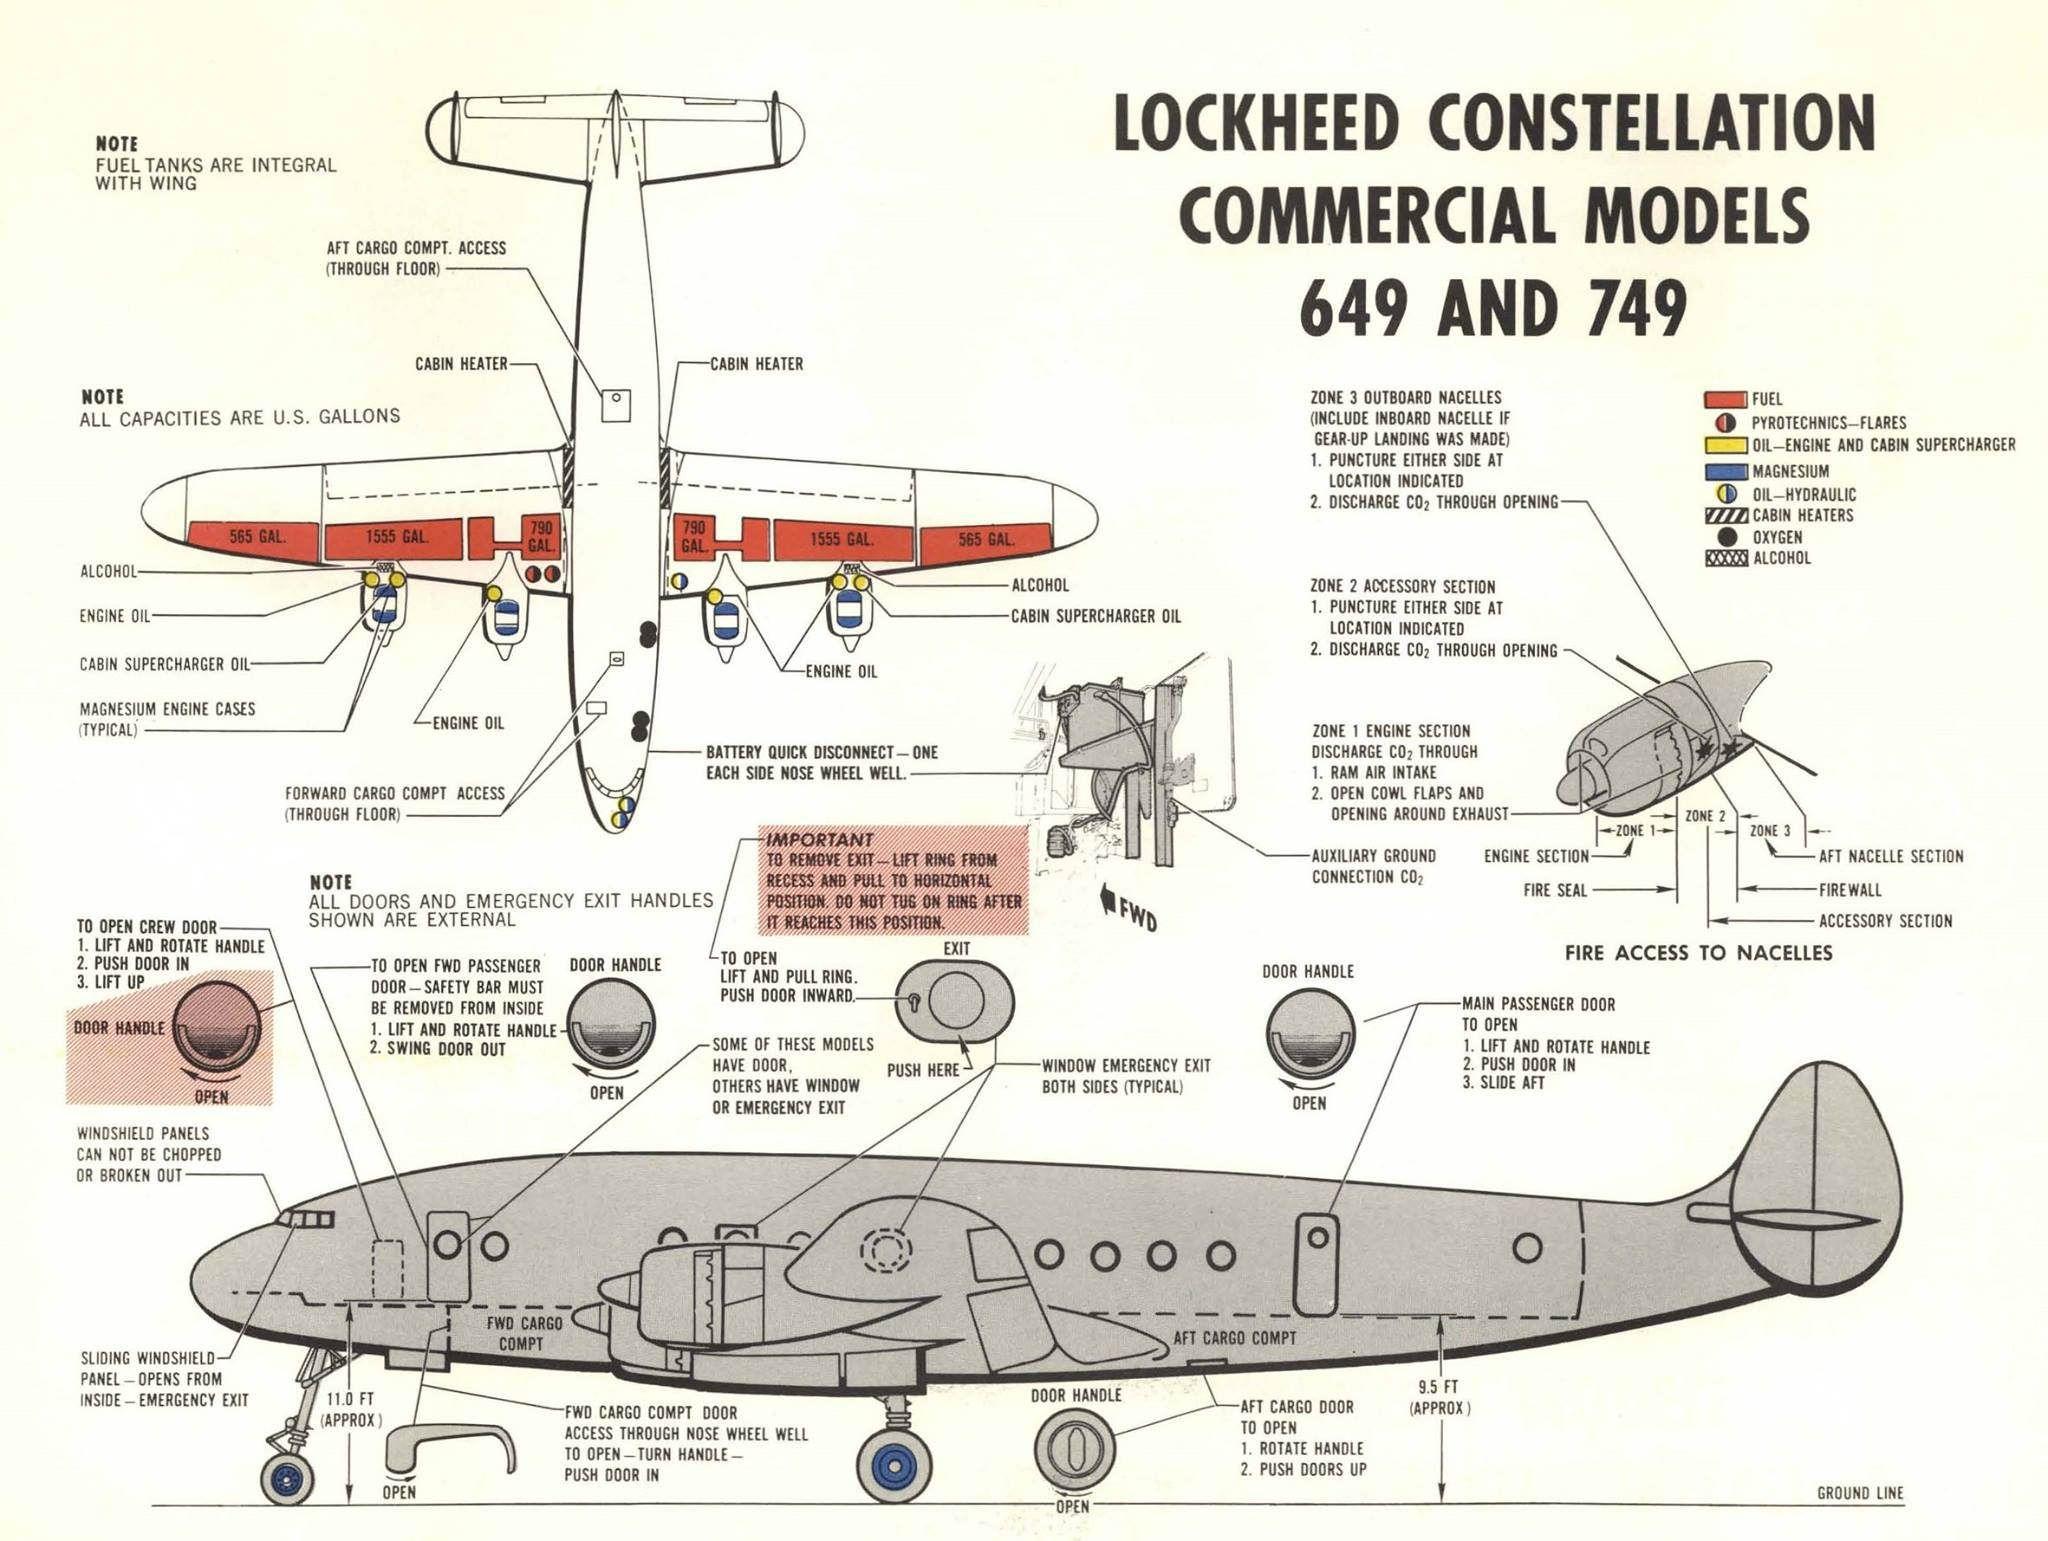 lockheed l-649, l-749 constellation ground service diagram… | flickr